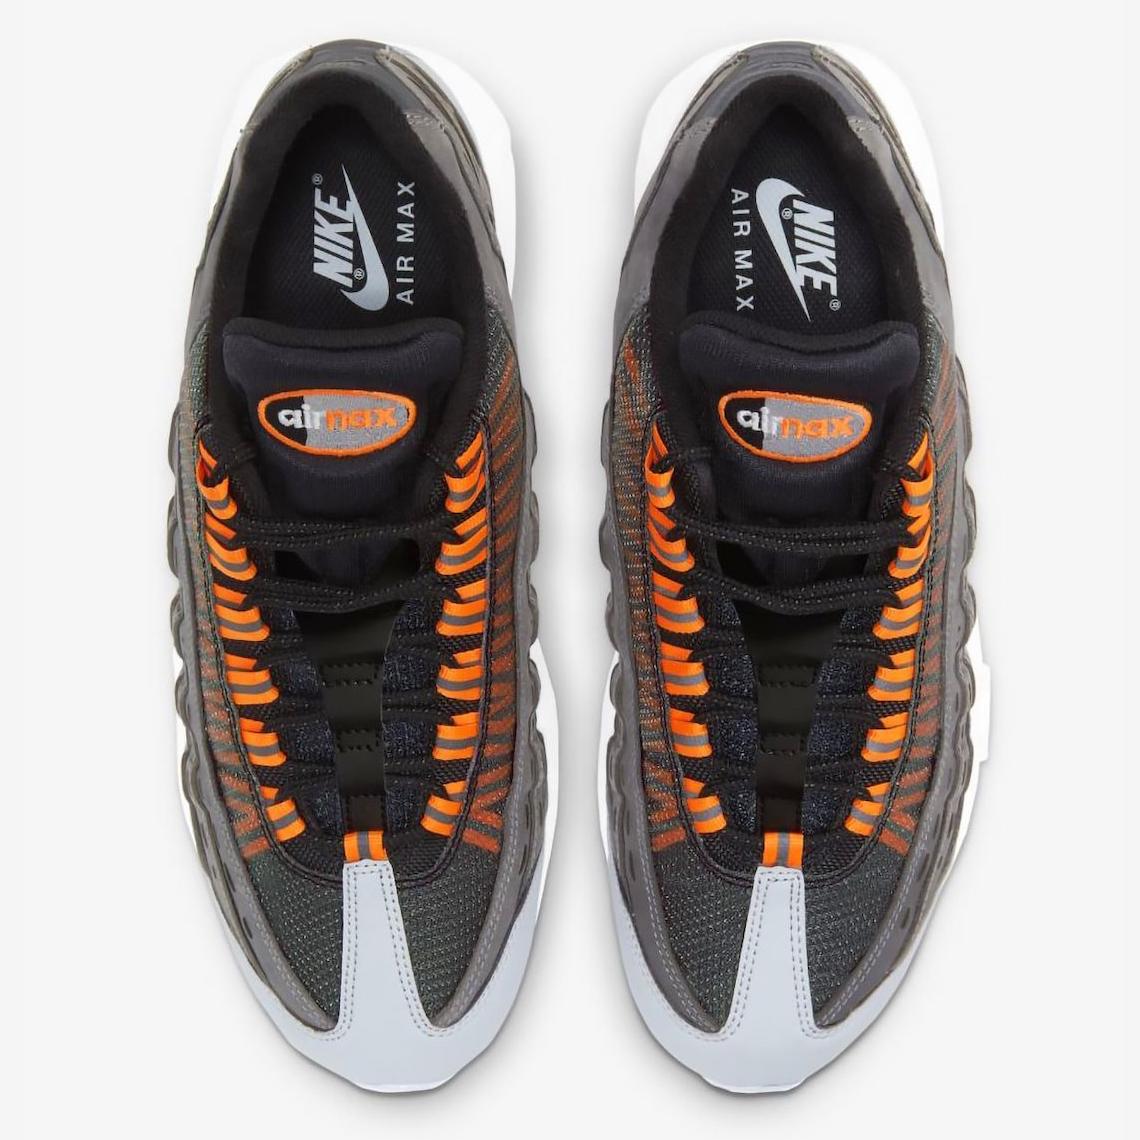 Kim Jones Nike Air Max 95 DD1871-001 Release Info | SneakerNews.com